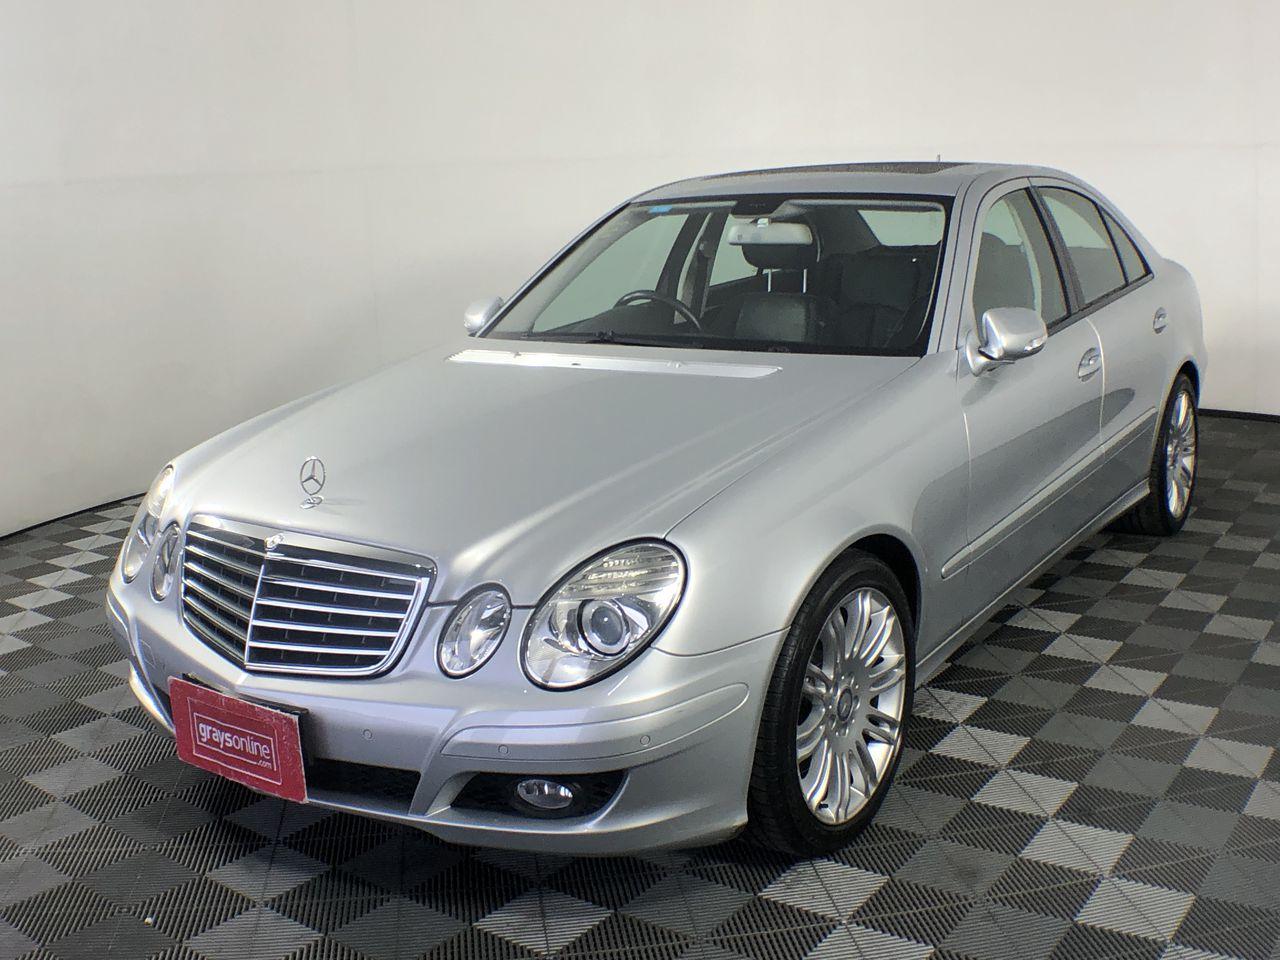 2008 Mercedes Benz E280 CDI Classic W211 Turbo Diesel Automatic Sedan